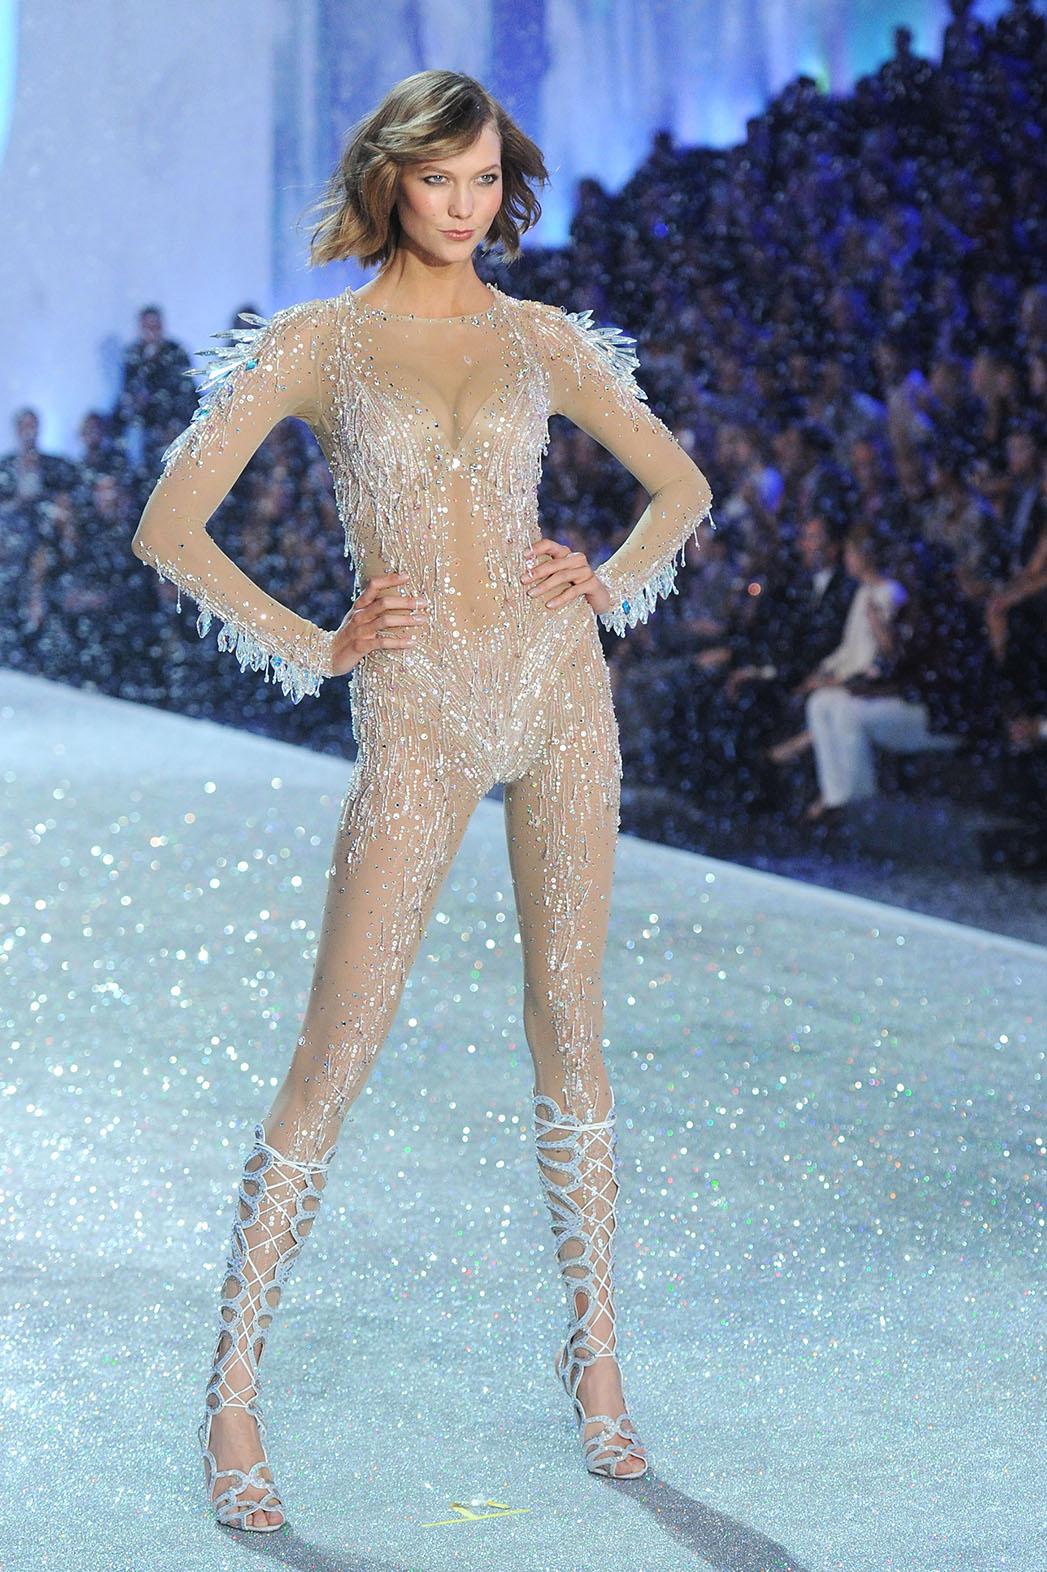 Karlie Kloss Victoria's Secret Fashion Show - Getty - P 2016